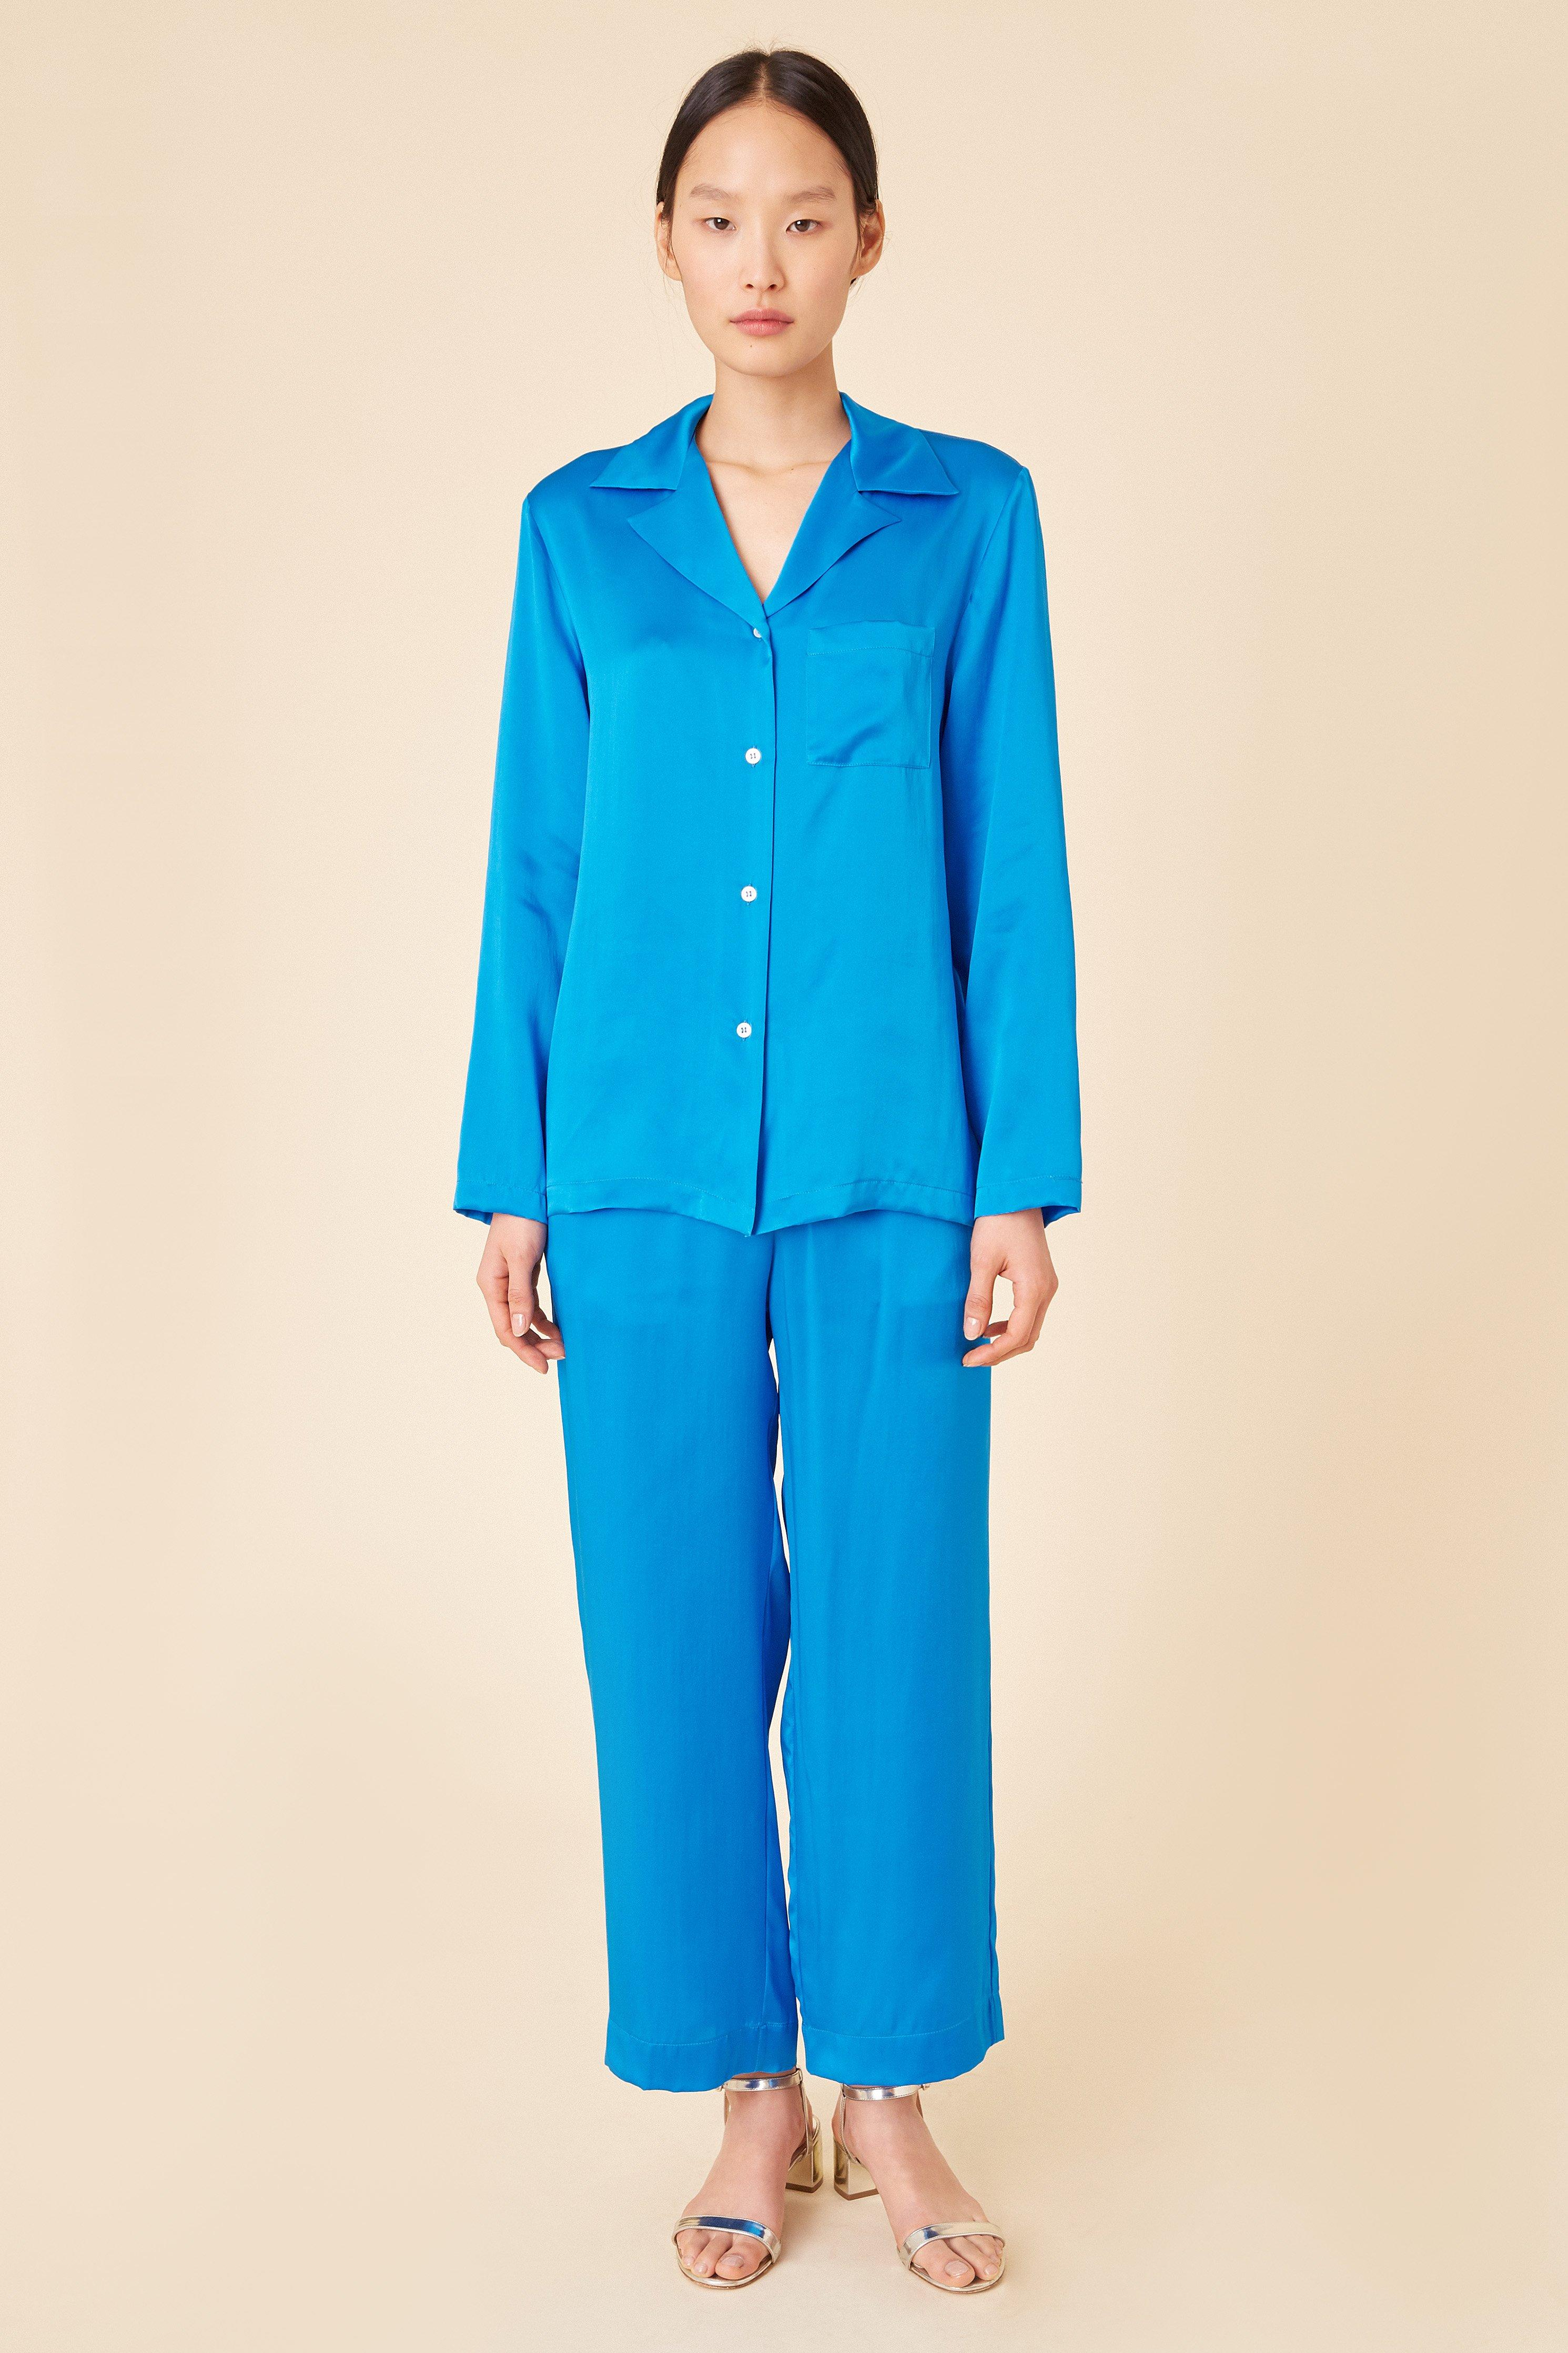 b309815e8c1e3 Lyst - Mansur Gavriel Silk Charmeuse Pajama Shirt - Royal in Blue